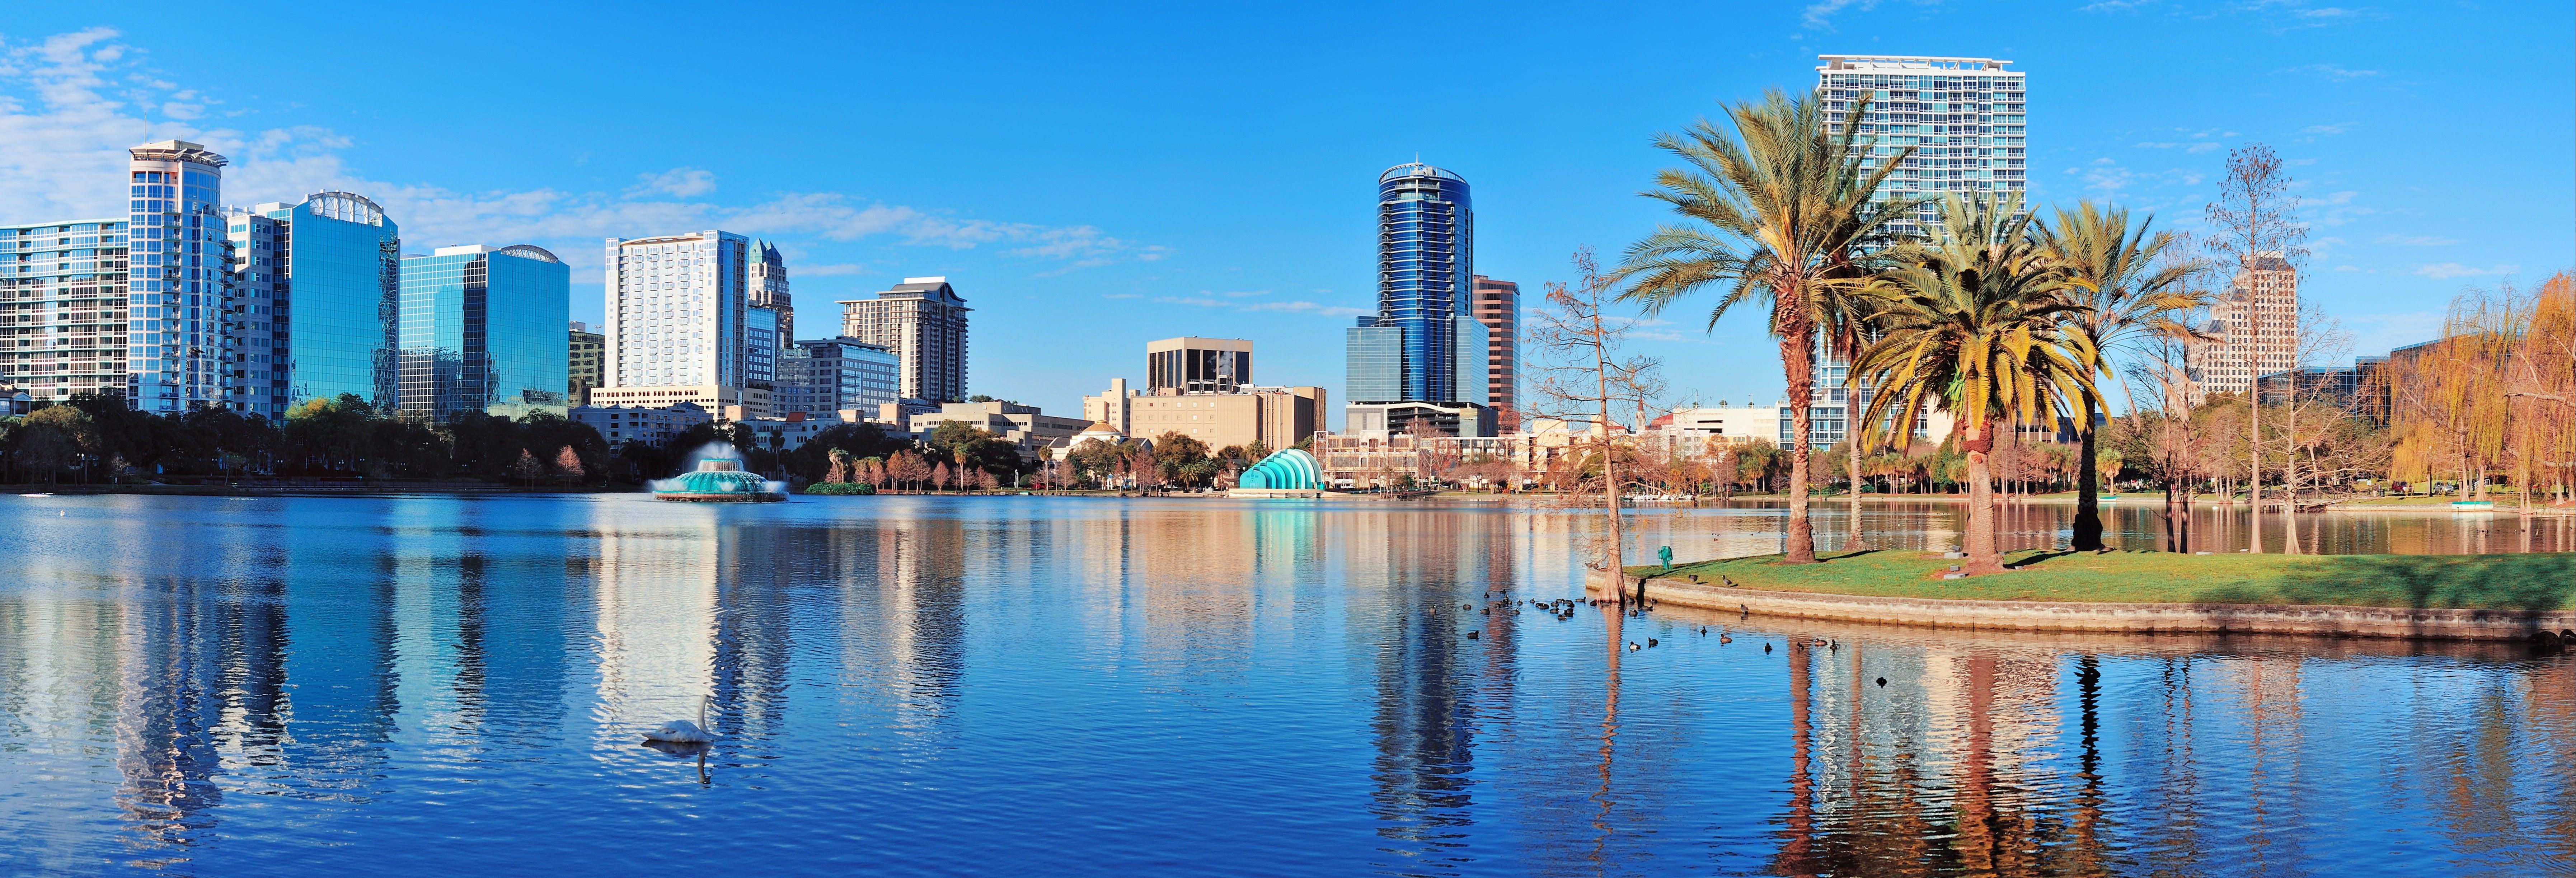 Visita guidata di Orlando